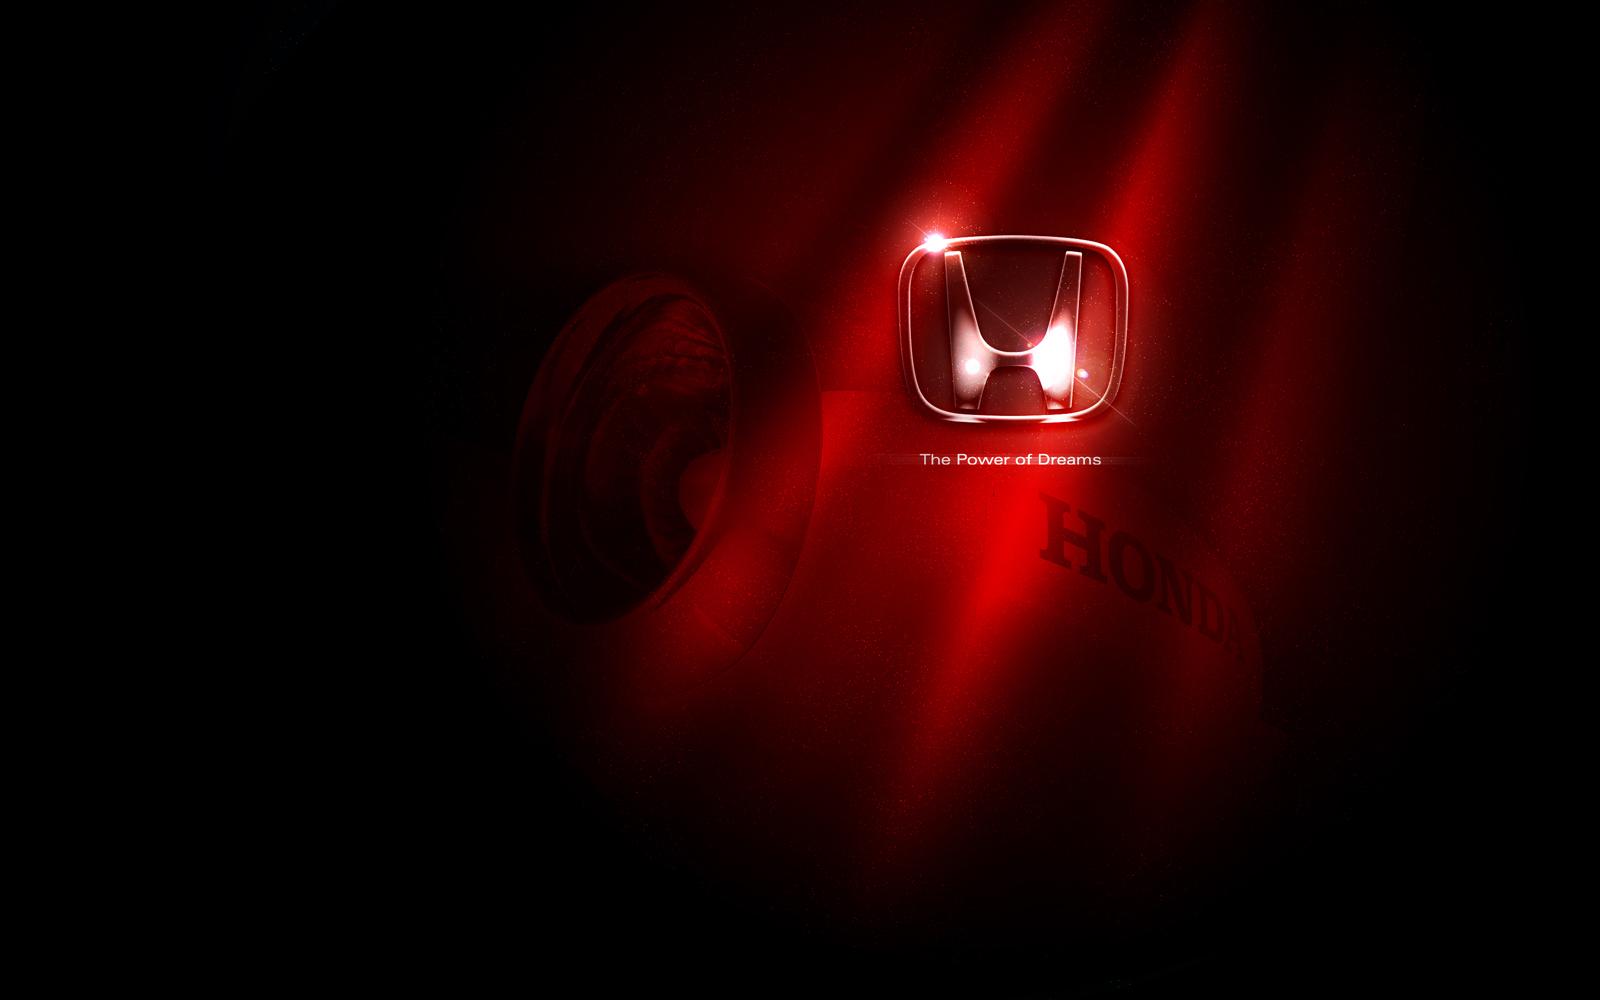 Honda Logo The Power Of Dreams Car HD Wallpaper 3763 HD Wallpaper 1600x1000